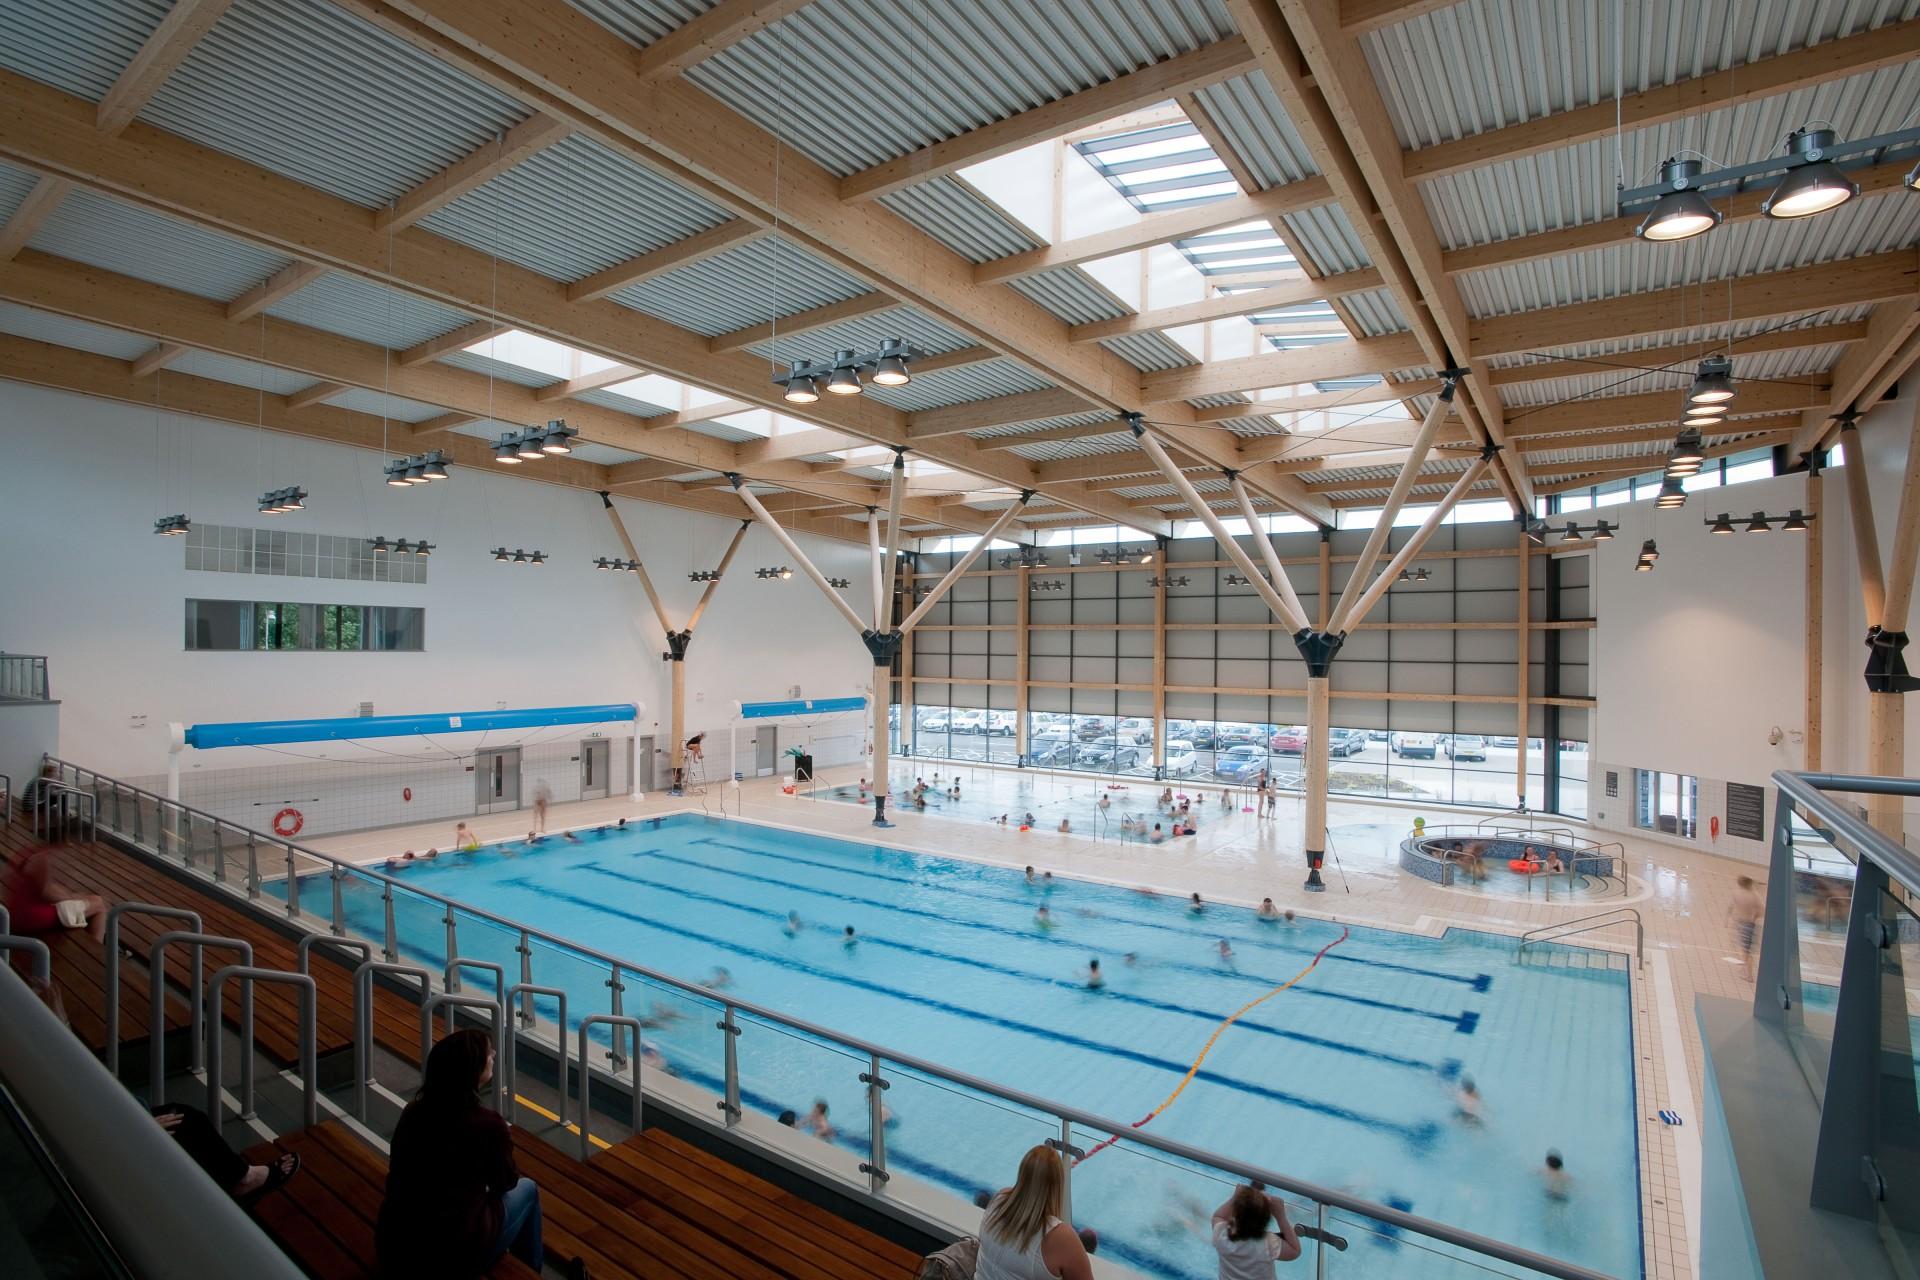 Leisure trusts help councils save money